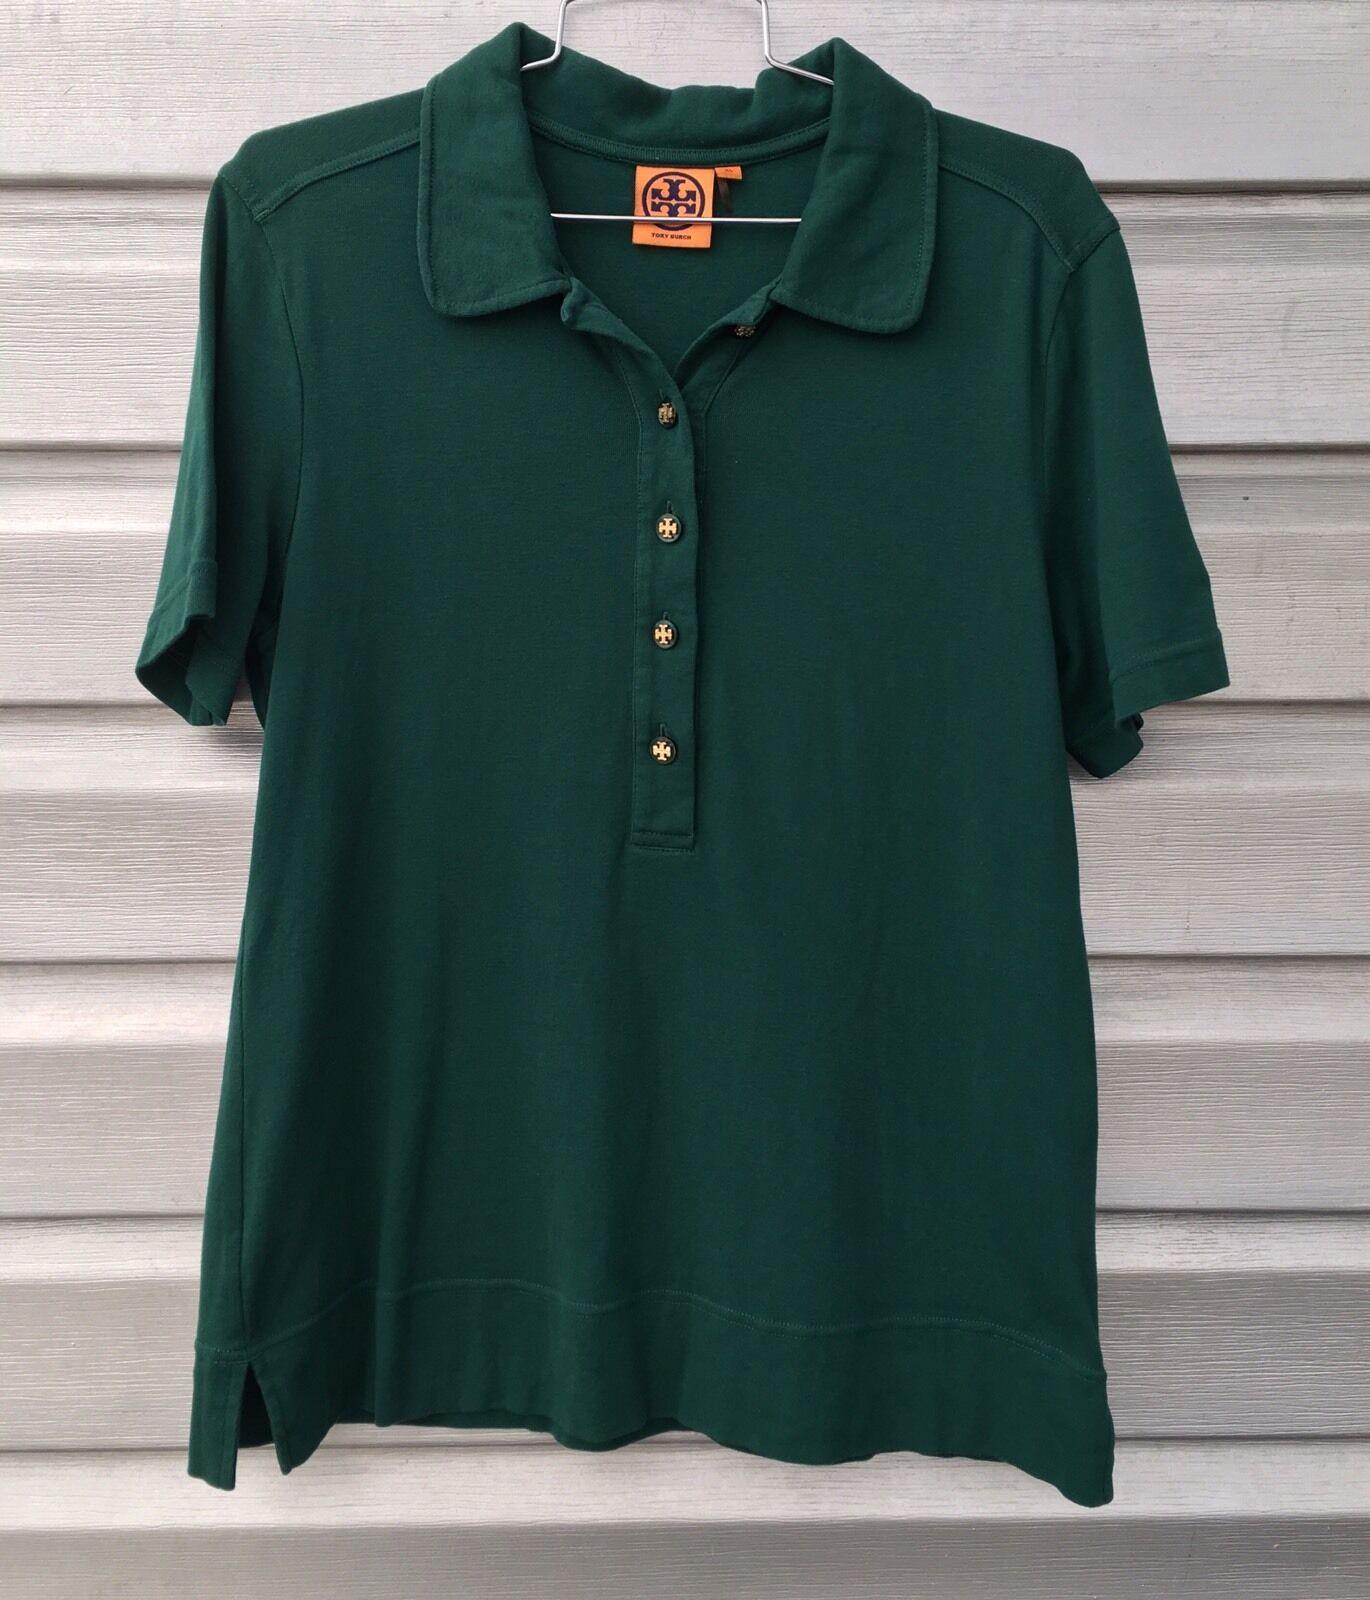 TORY BURCH Emerald Grün Short Sleeve Polo Shirt Top